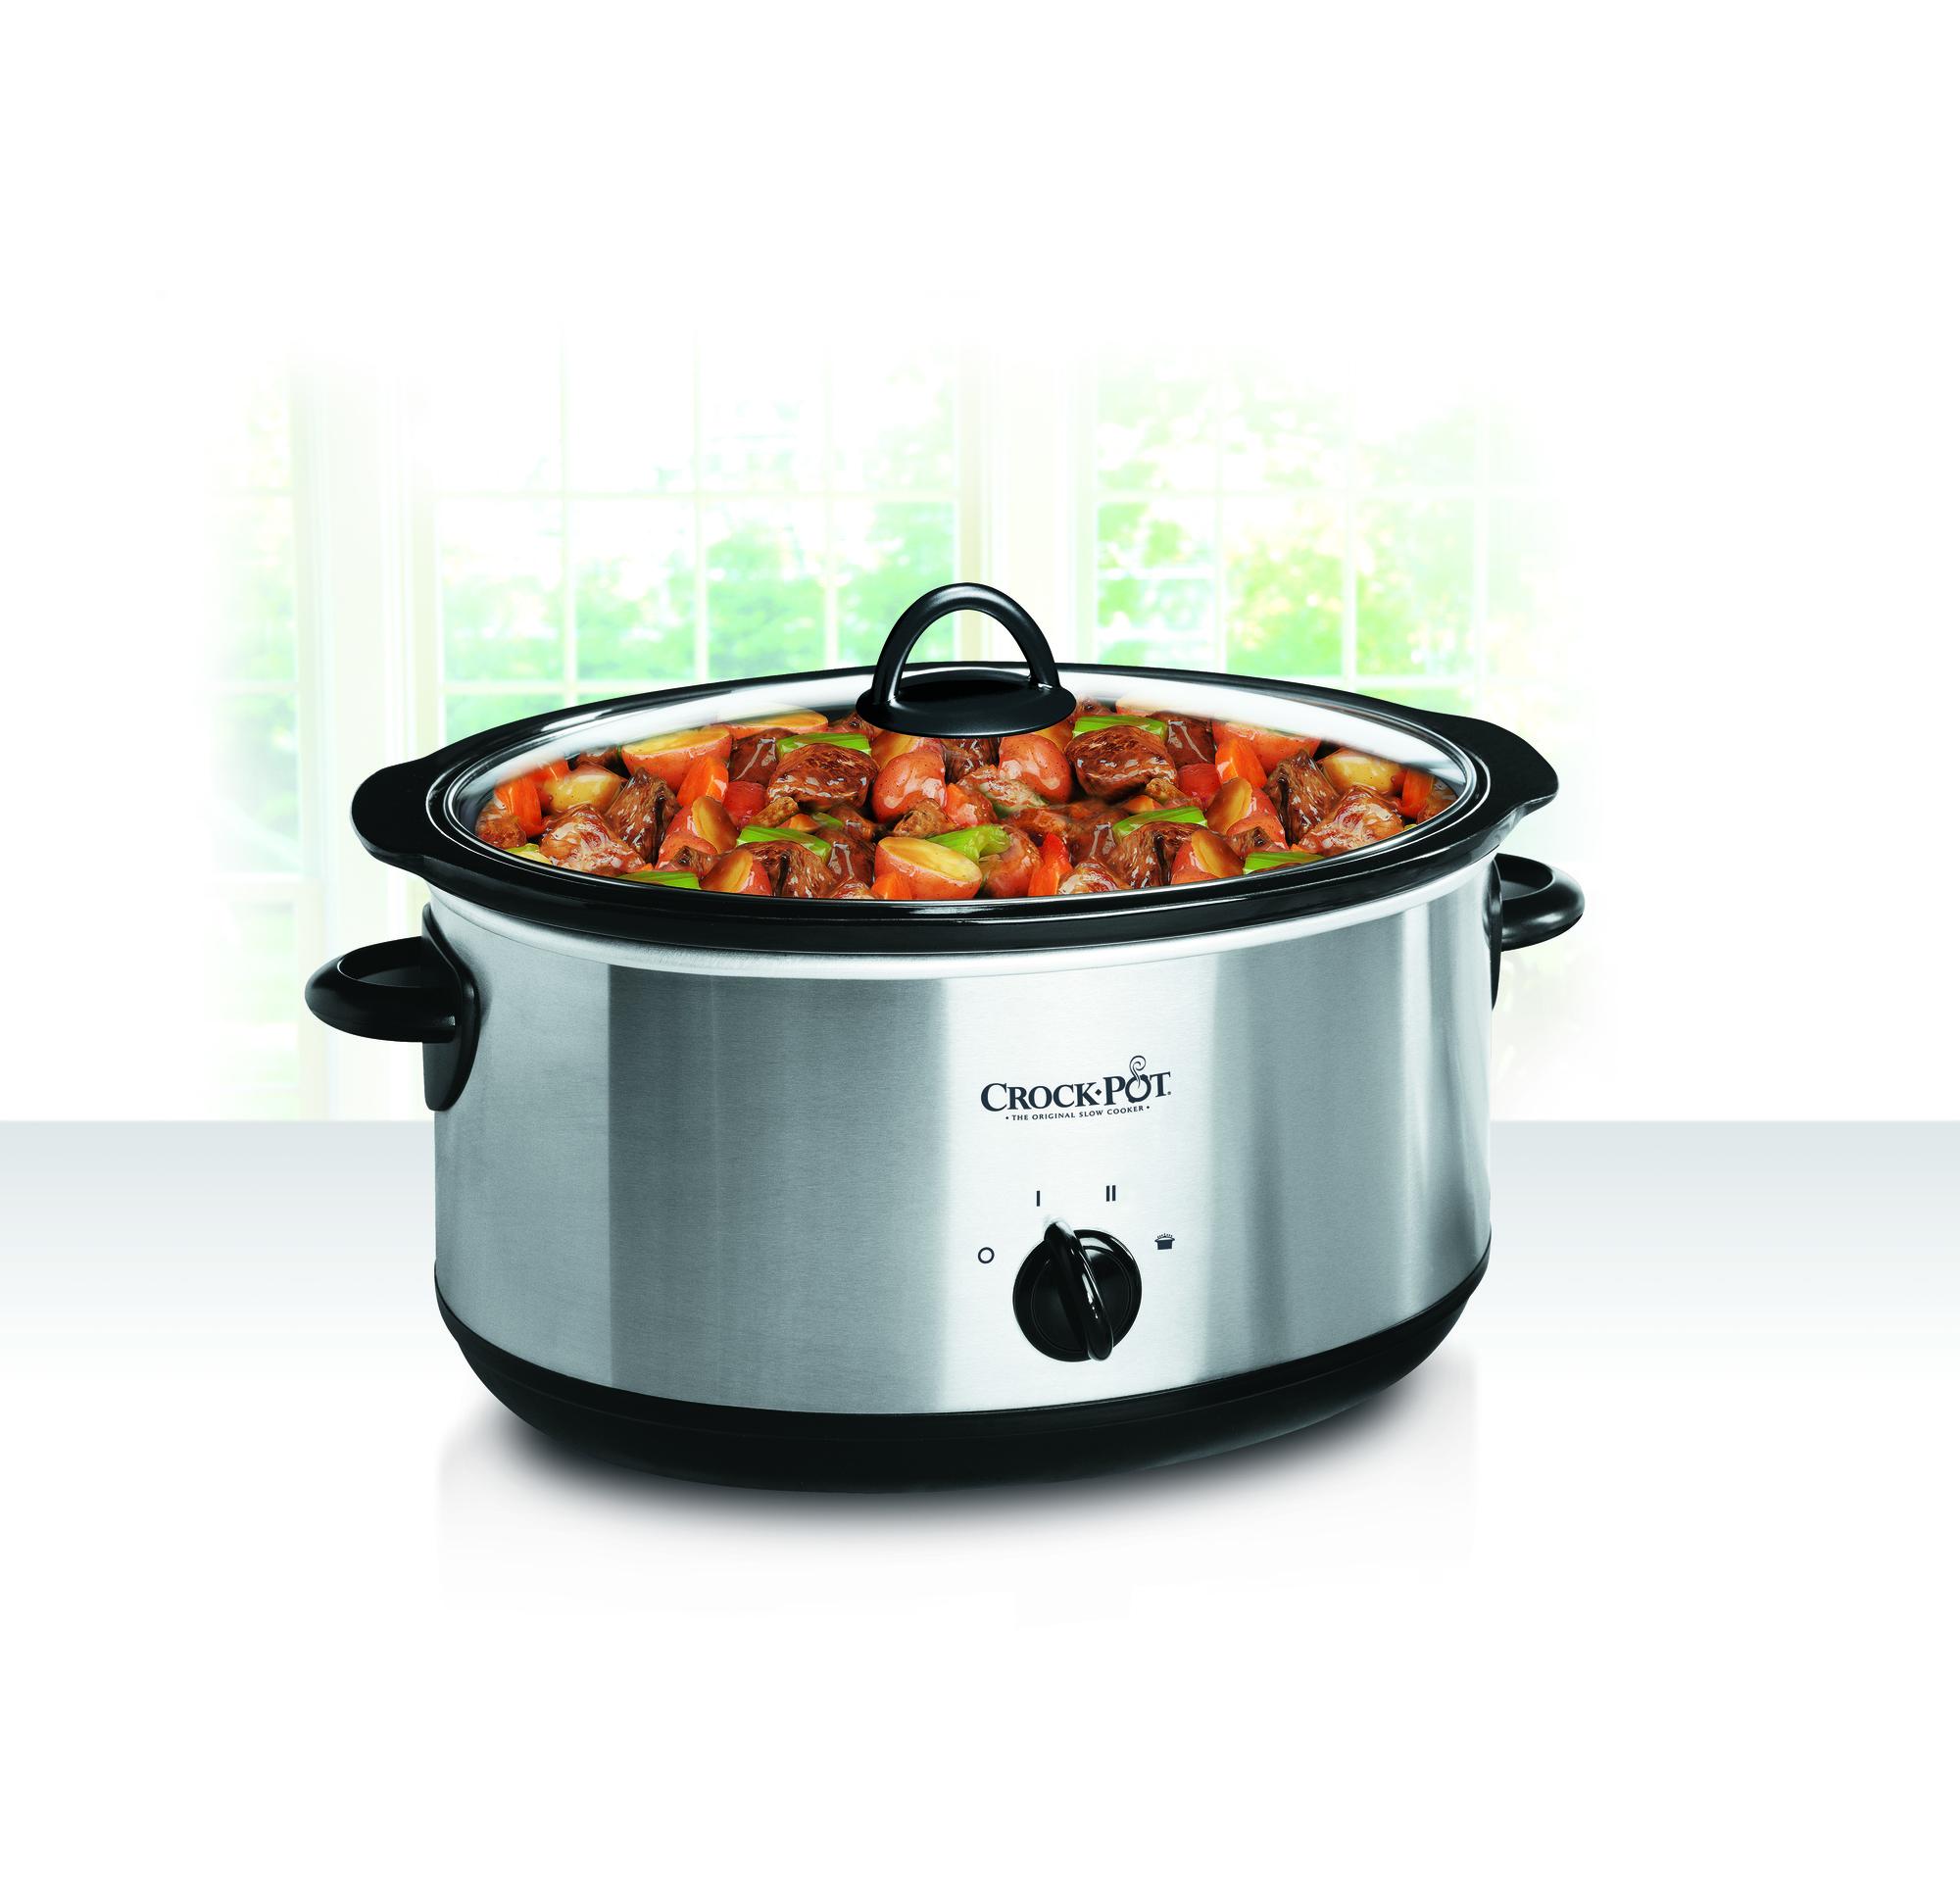 Walmart In Store Only - Crock-Pot 5 Quart Slow Cooker $9.88 YMMV B/M